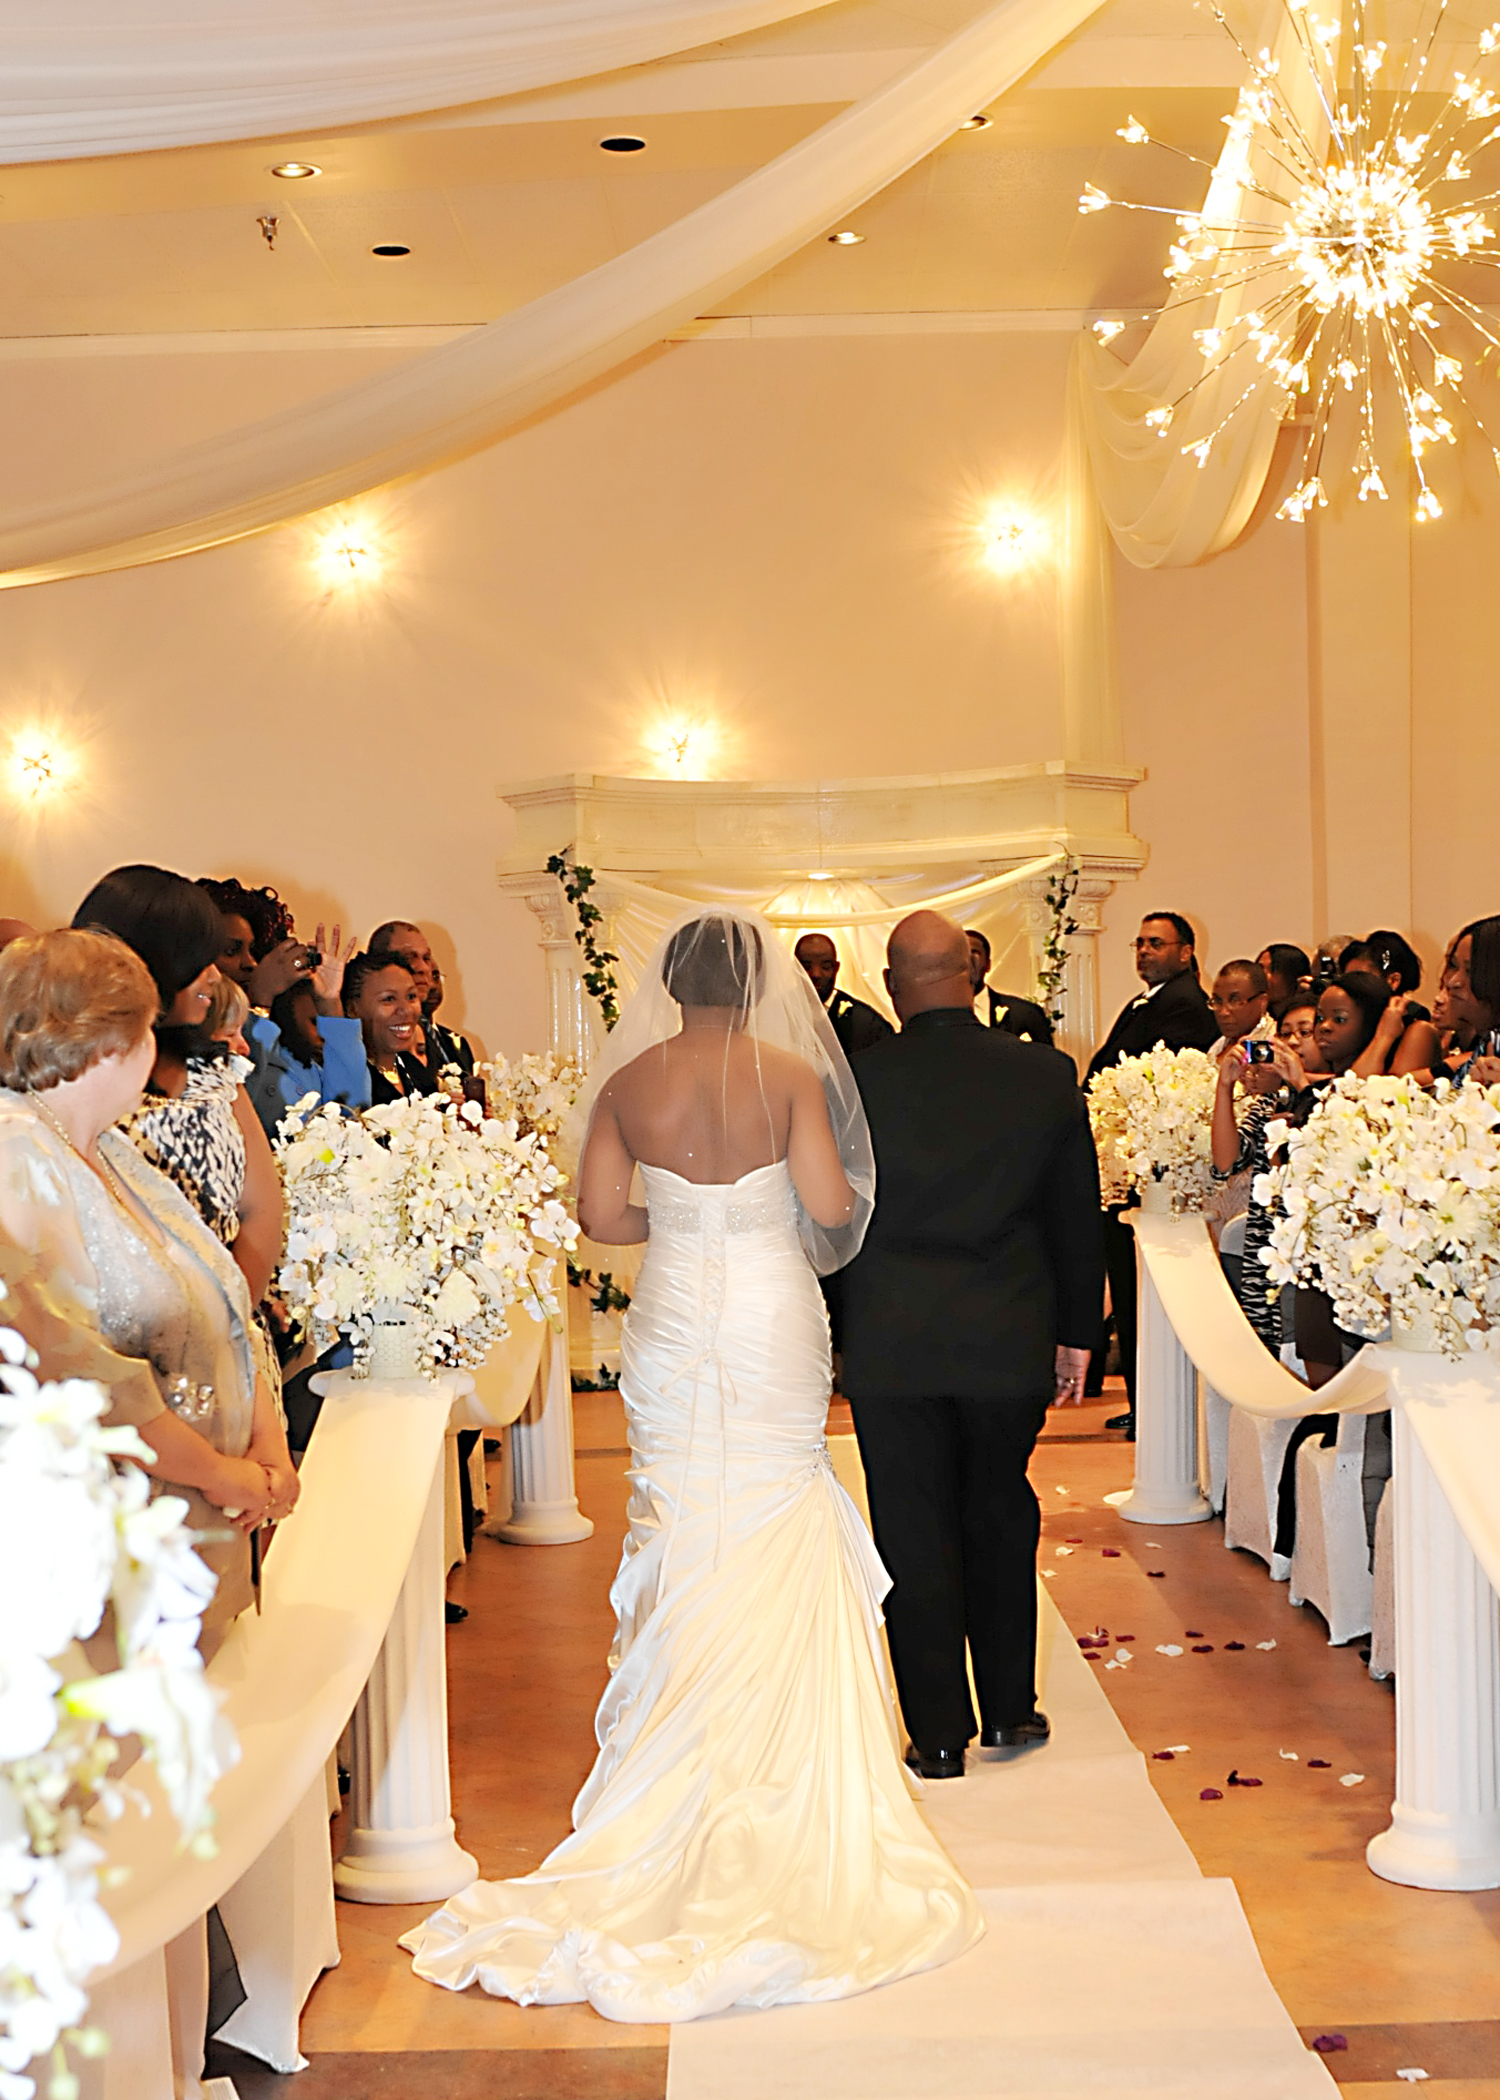 Indoor Wedding Ceremony In Southwest Houston